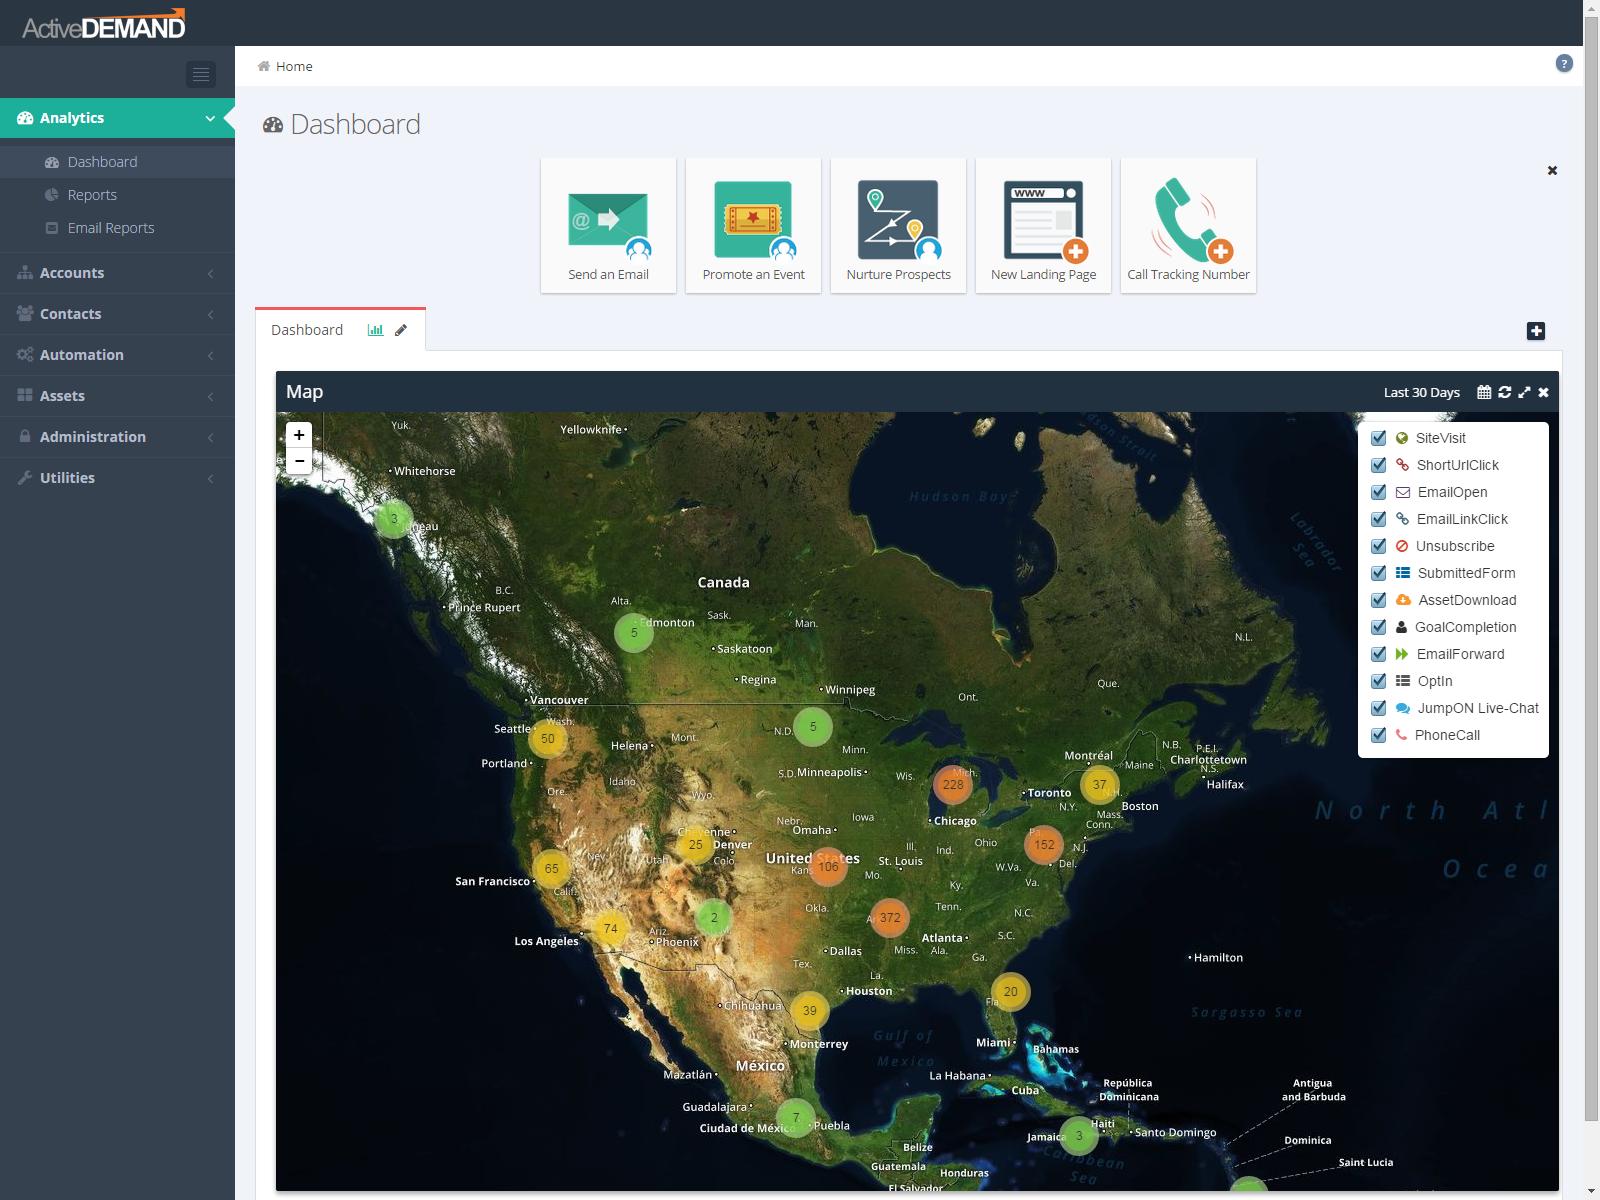 ActiveDEMAND Software - ActiveDEMAND dashboard map